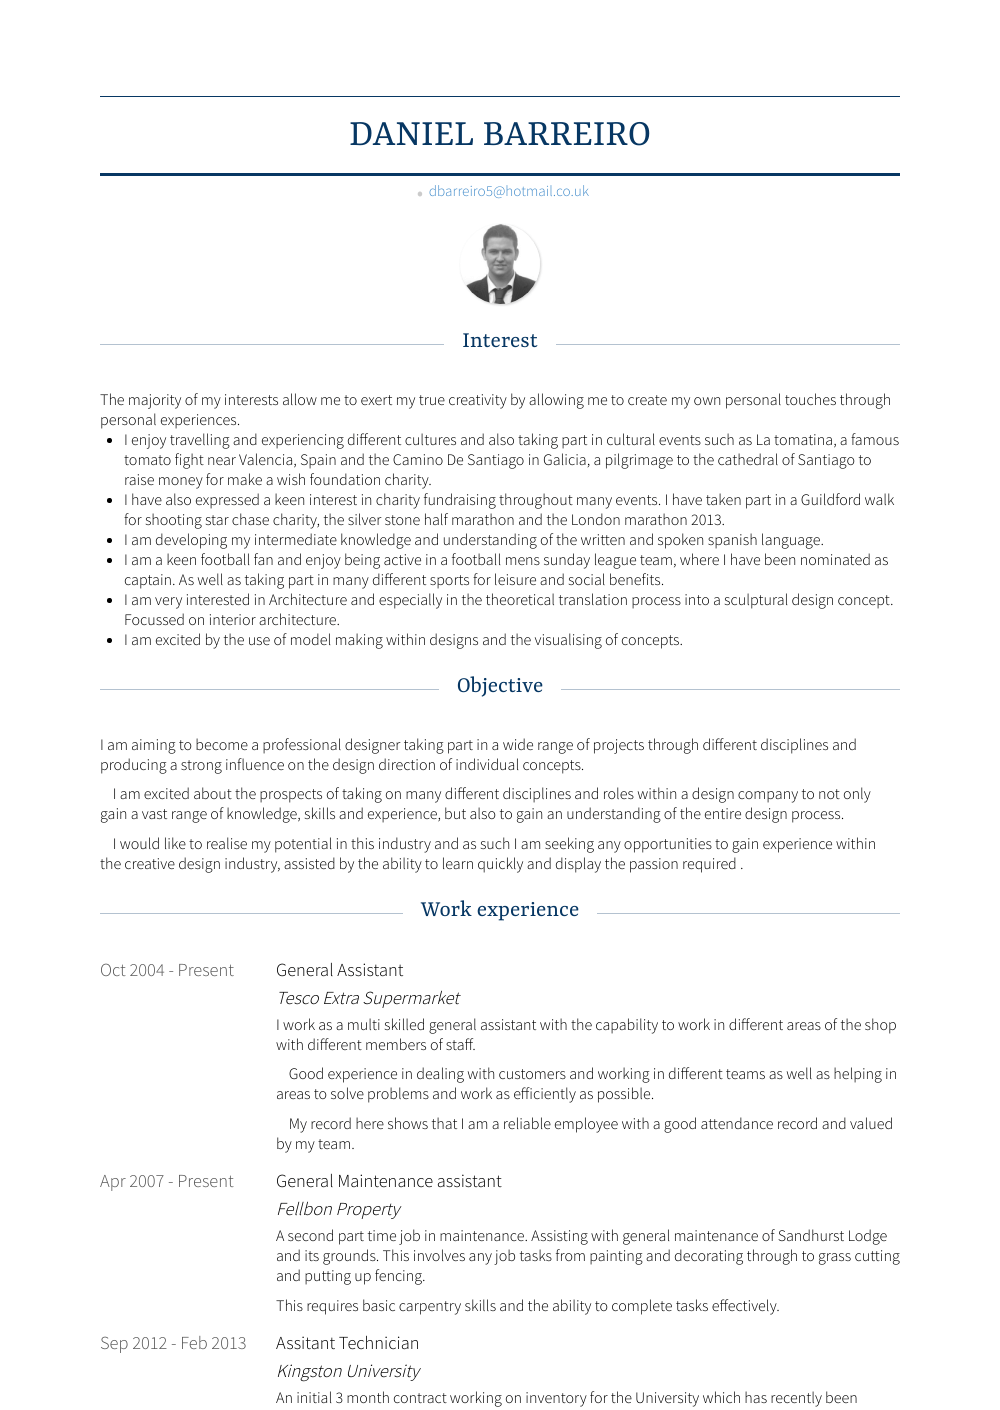 General Assistant Resume Sample